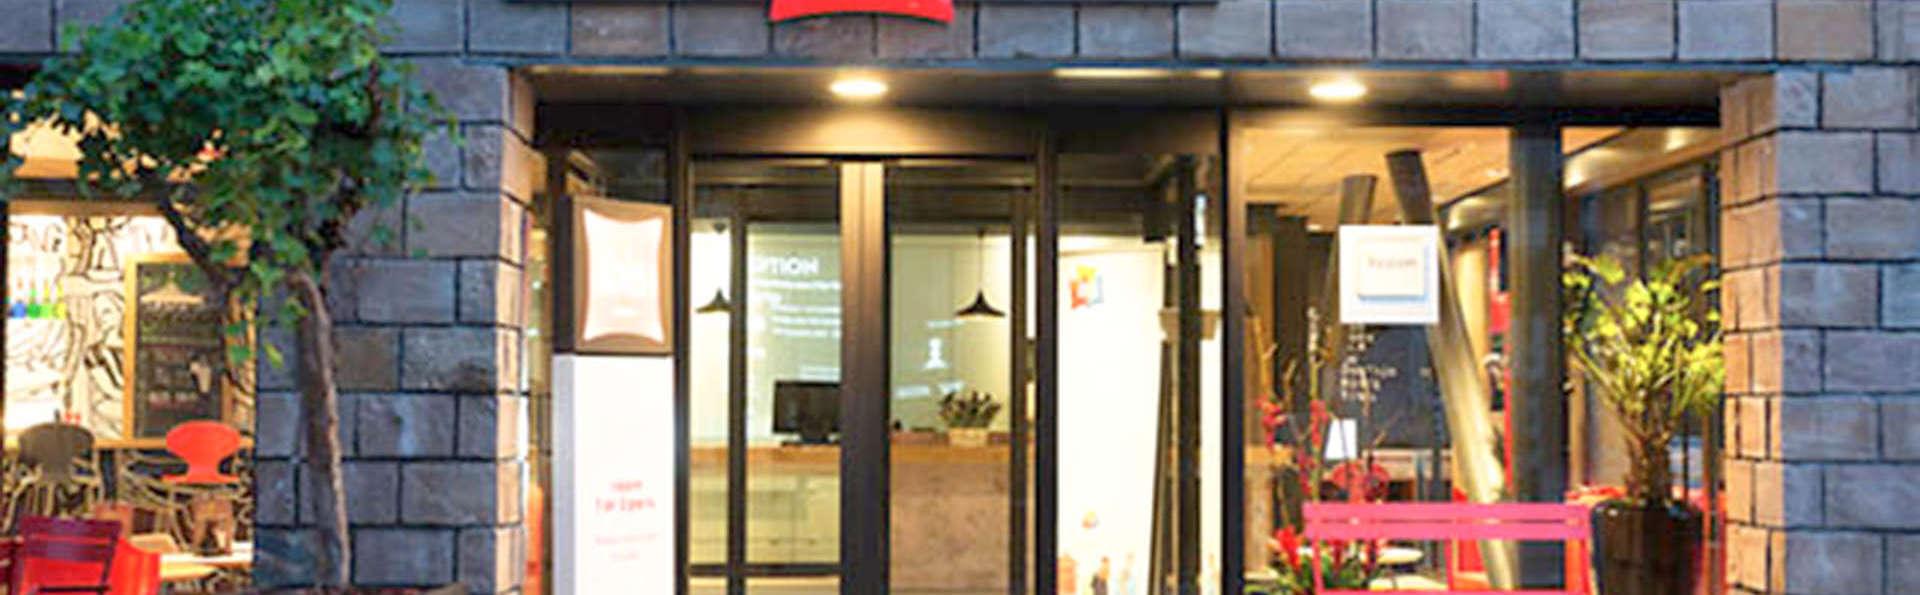 Ibis Rotterdam City Center - EDIT_FRONT_01.jpg